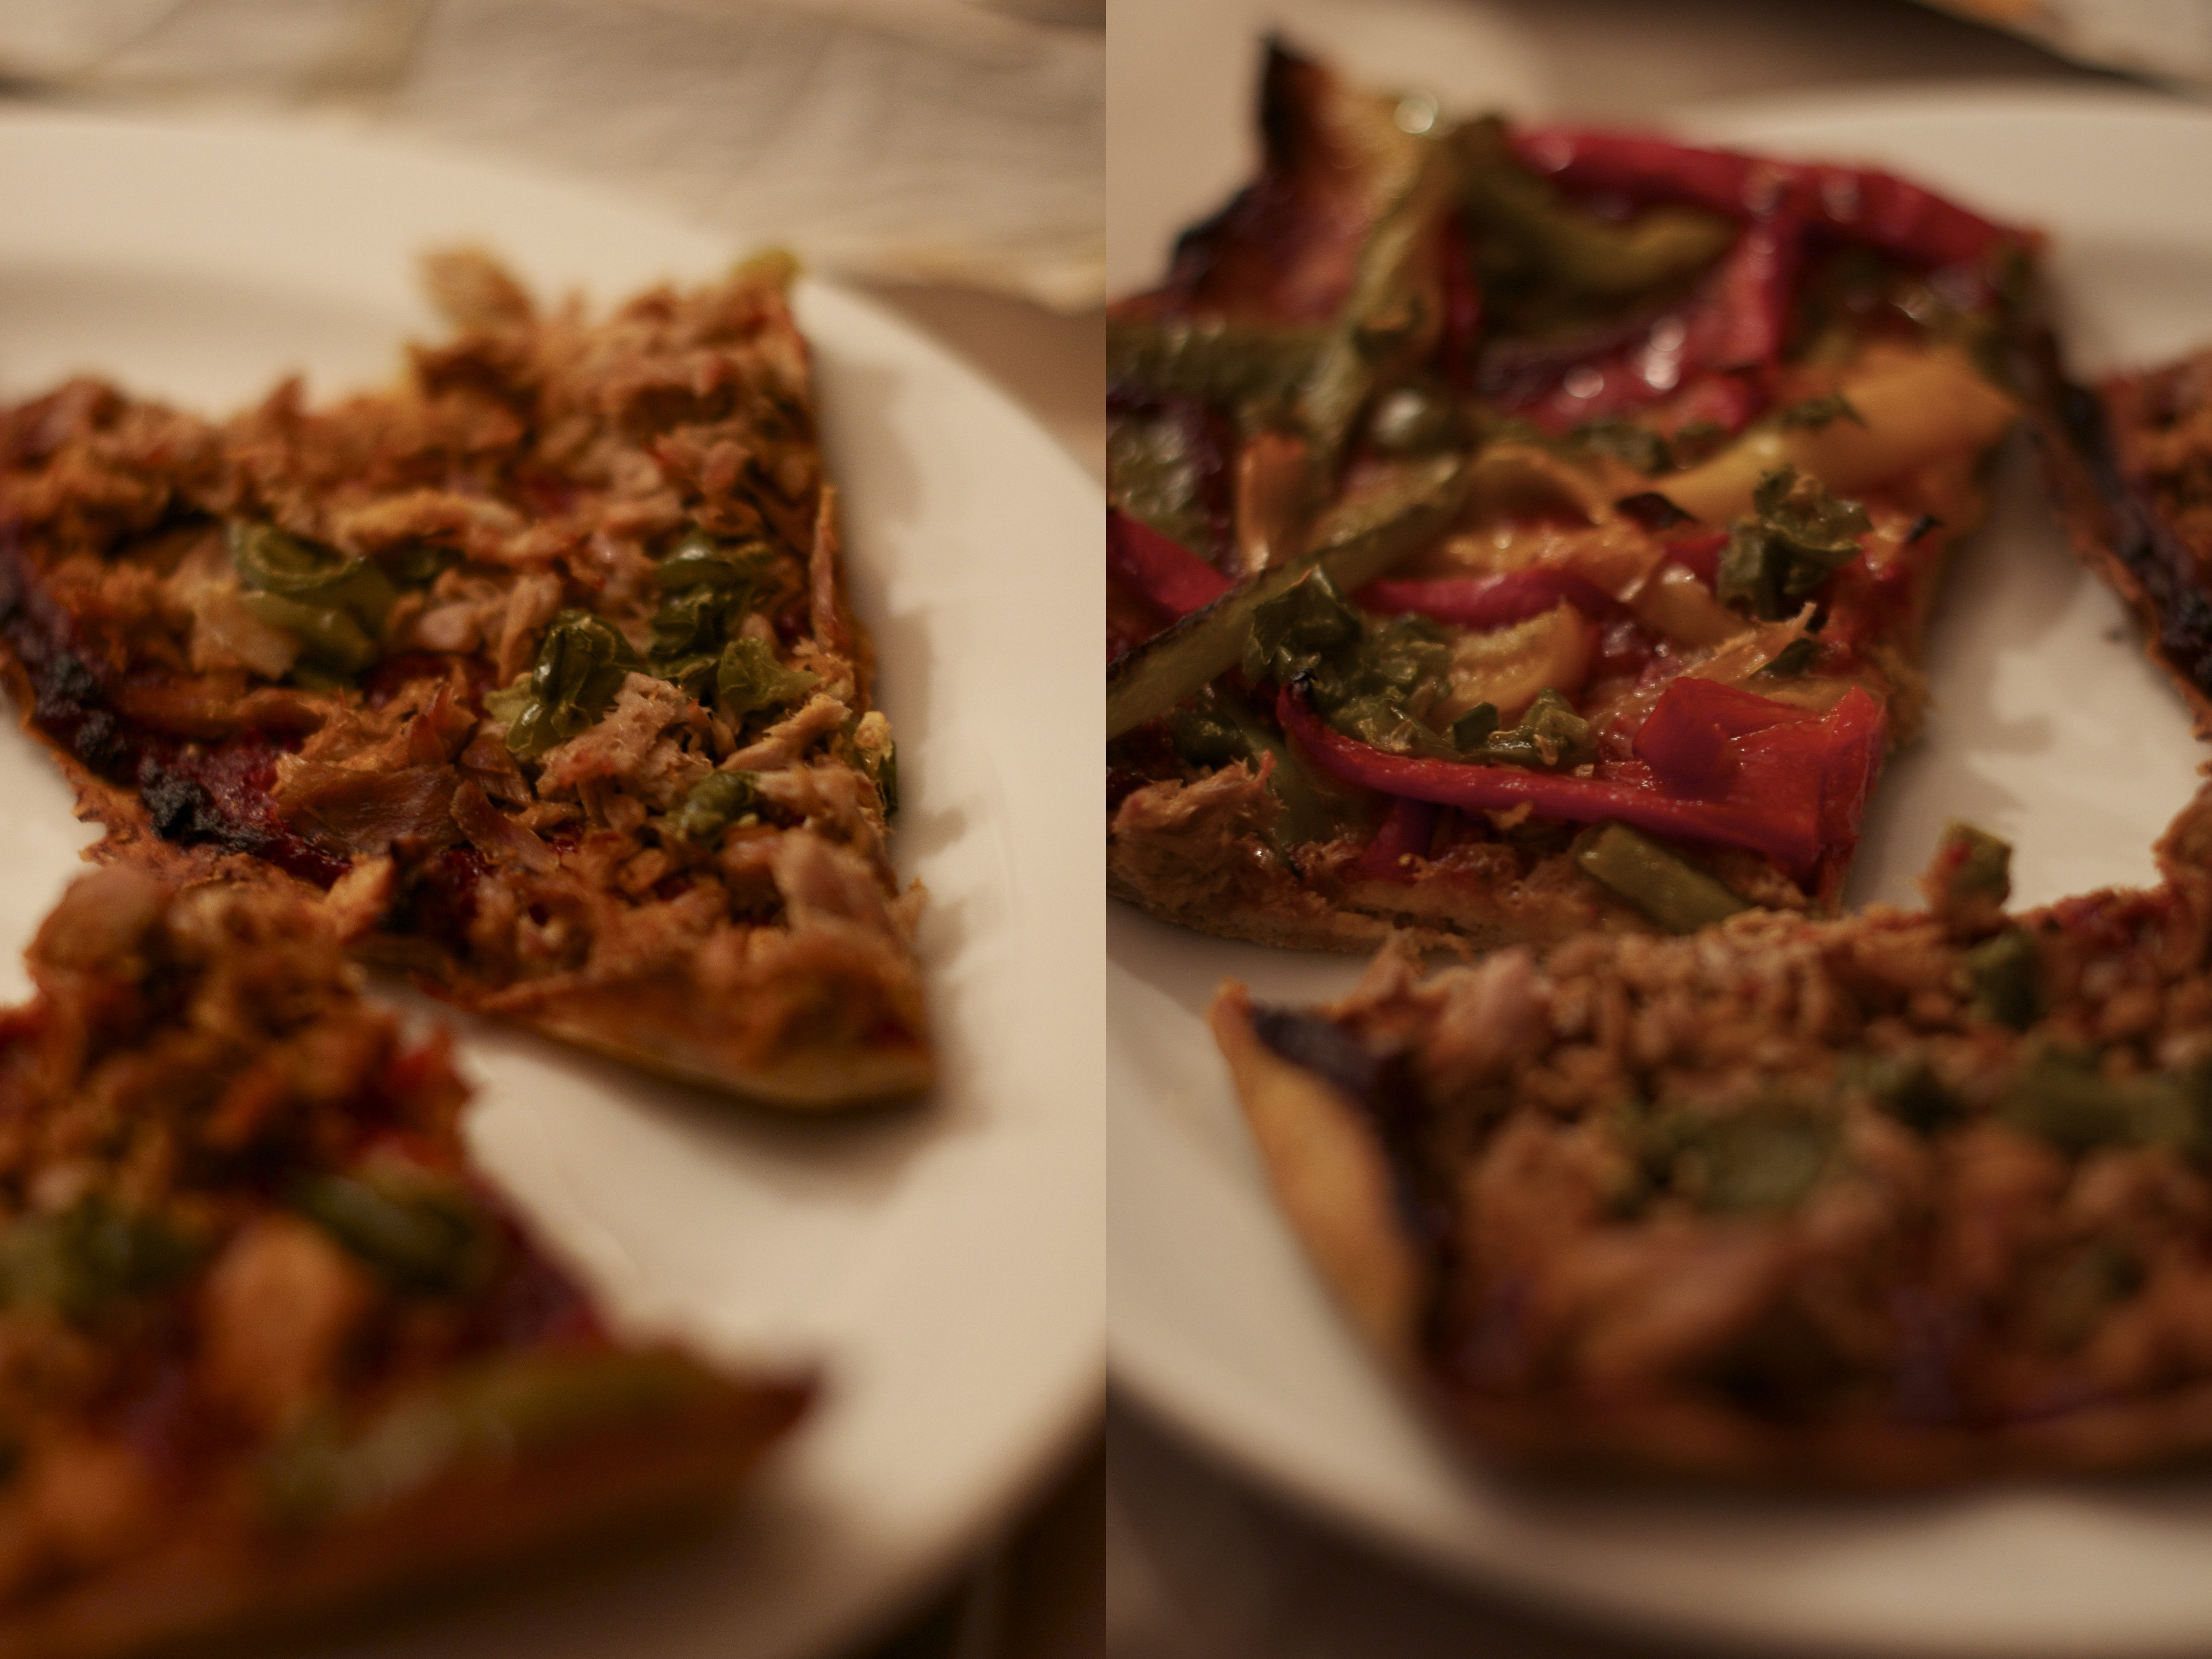 GLUTENFRI PIZZA + OPSKRIFT PÅ VERDENS BEDSTE TOMATSAUCE » SUND MUMSSUND MUMS